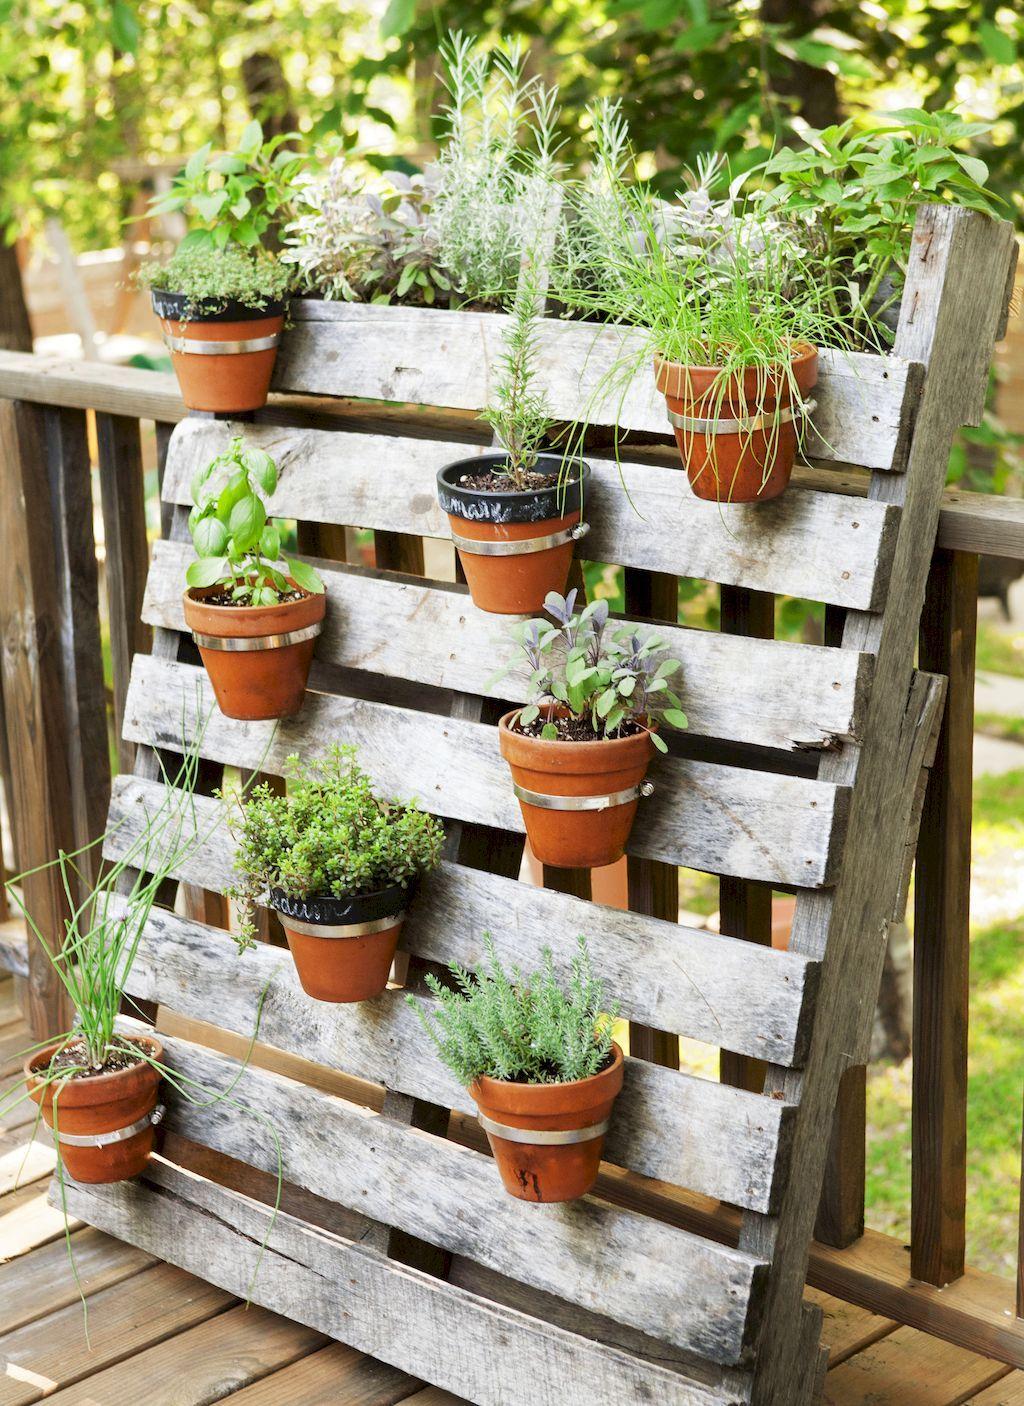 60 low maintenance small backyard garden ideas | backyard garden